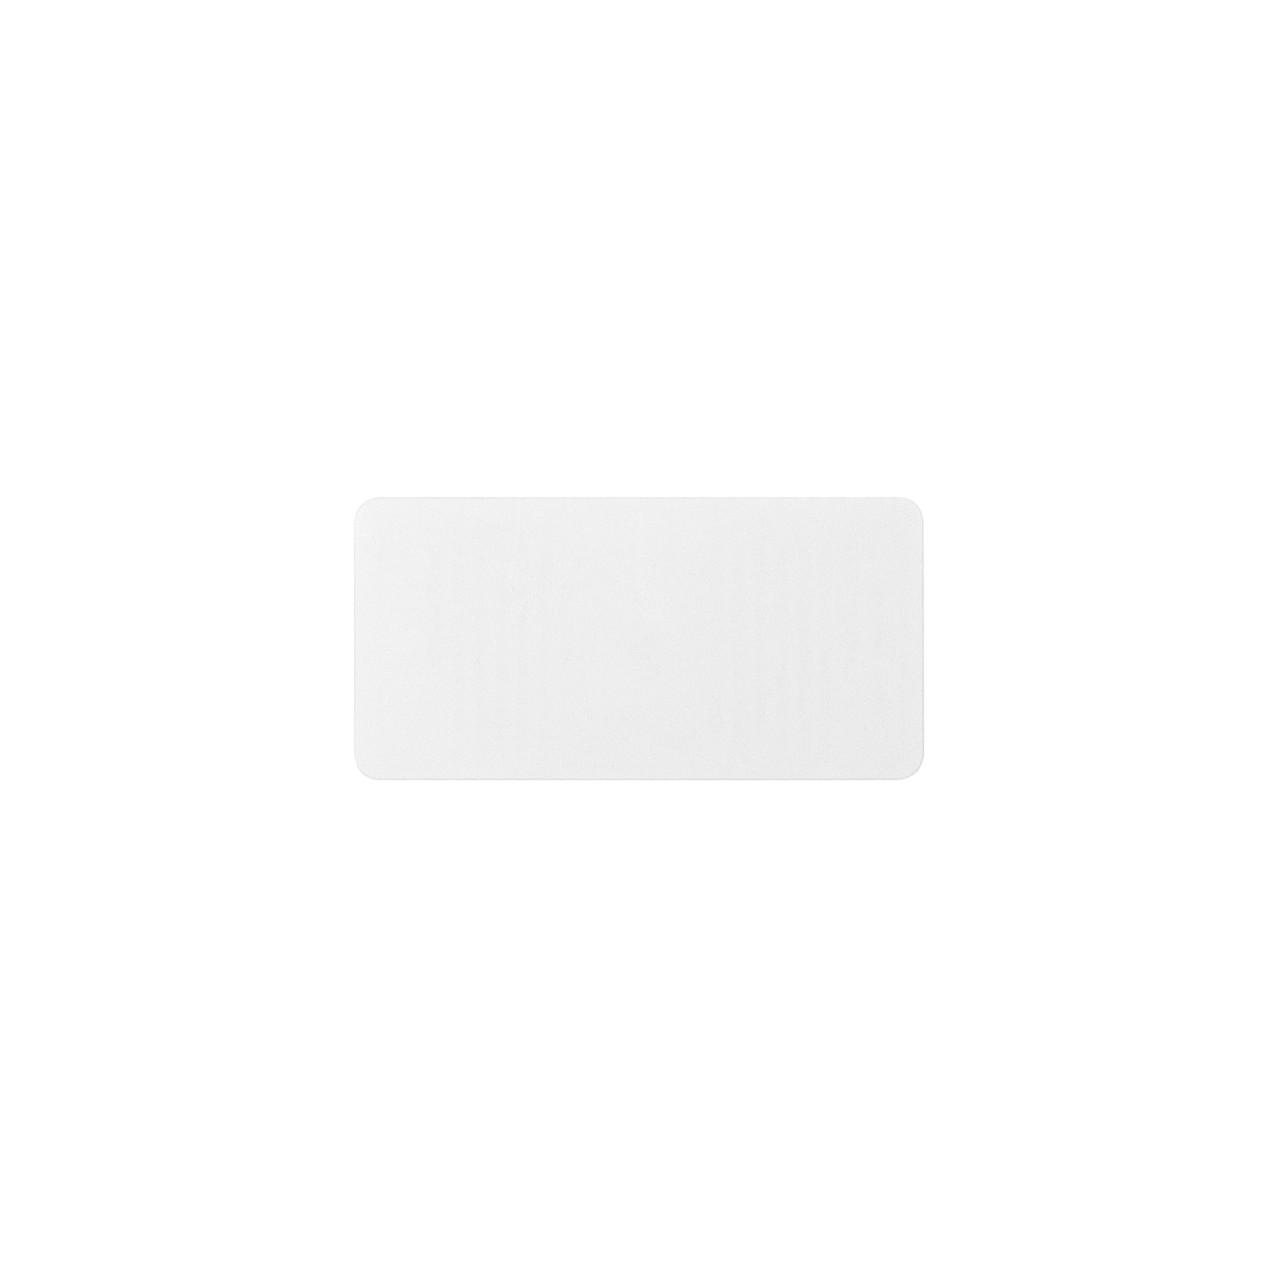 Tageos EOS-241 RFID Apparel Tag - 15,809 Tags [Clearance]